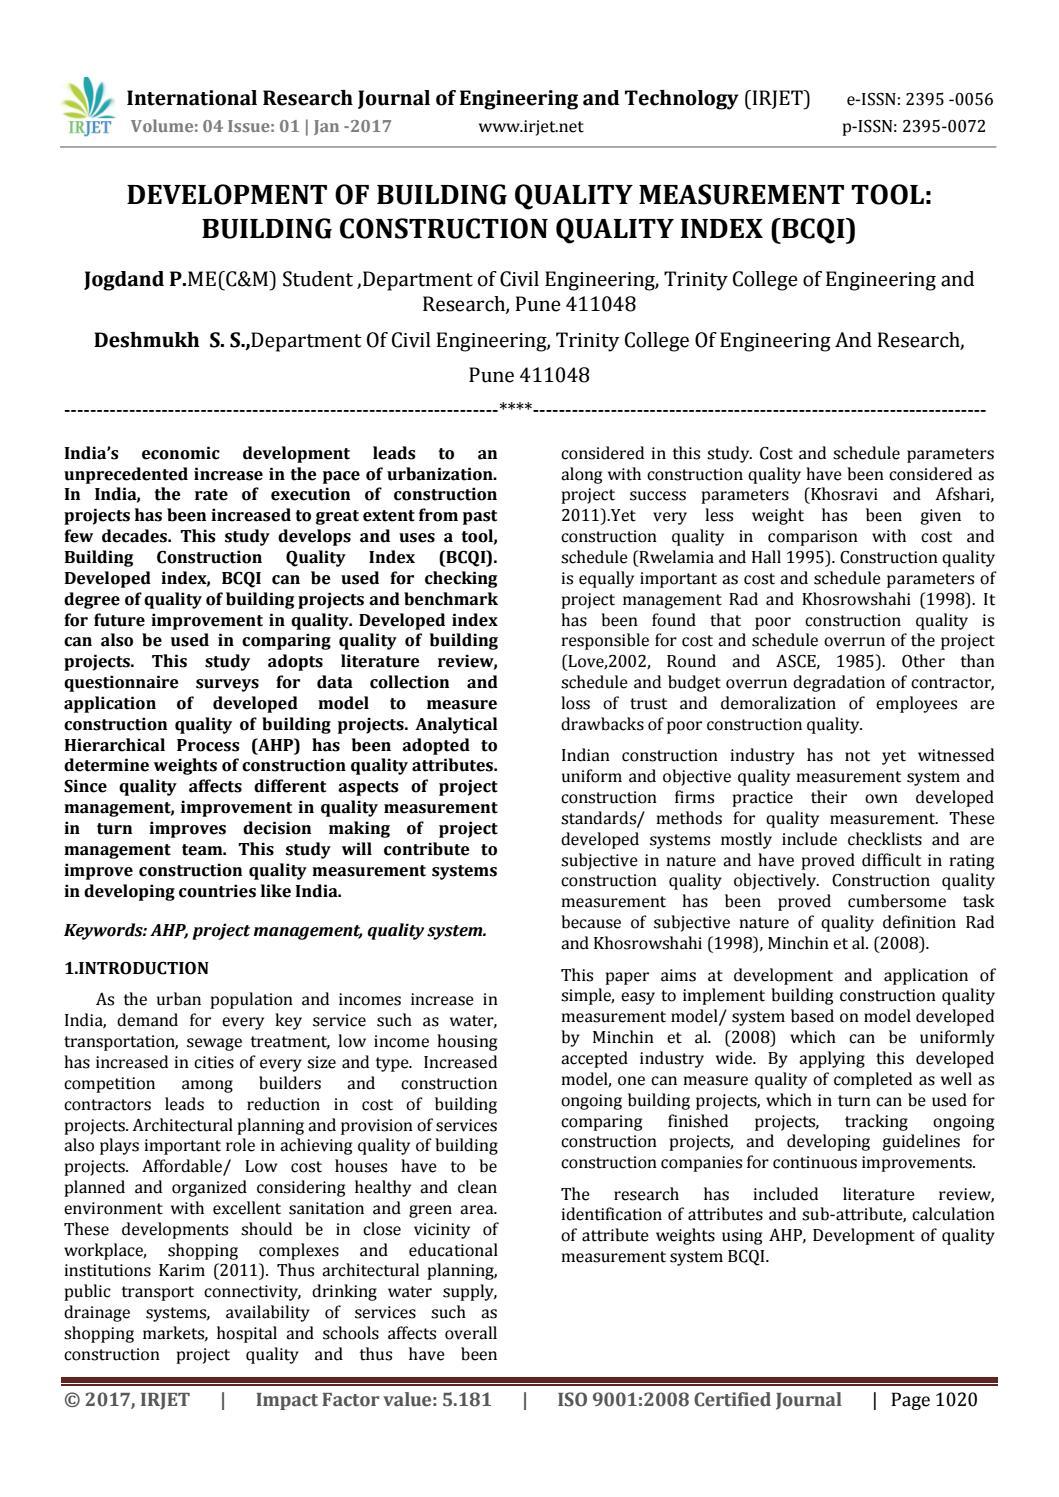 Development of Building Quality Measurement Tool: Building